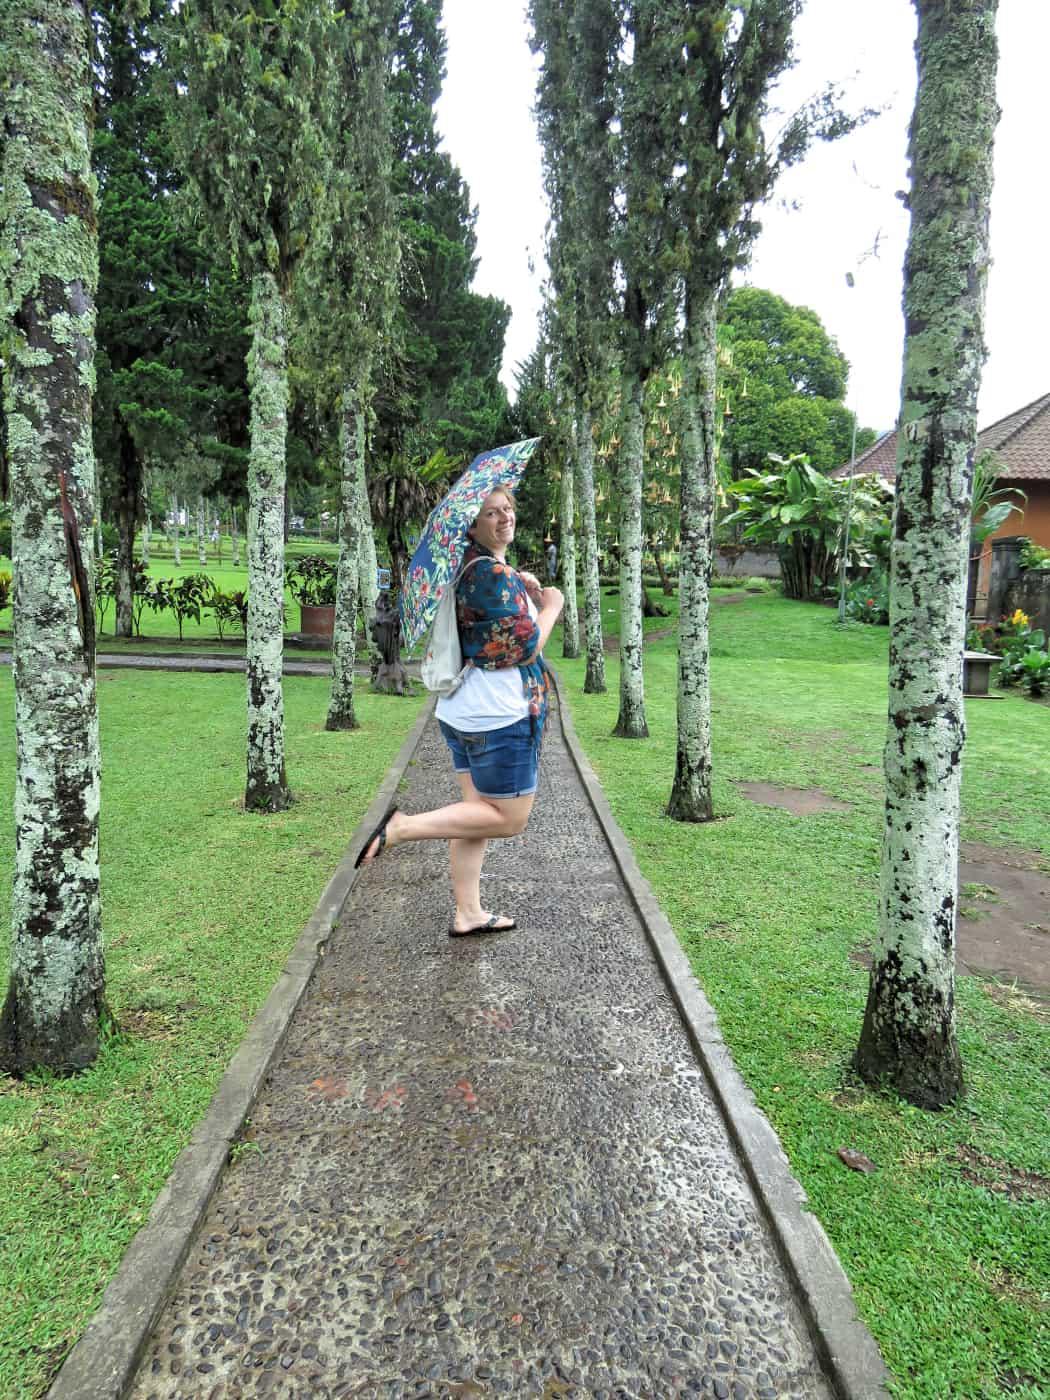 gogirlrun_bali_indonesien_privatetour_norden_Pura Ulun Danu Bratan_88